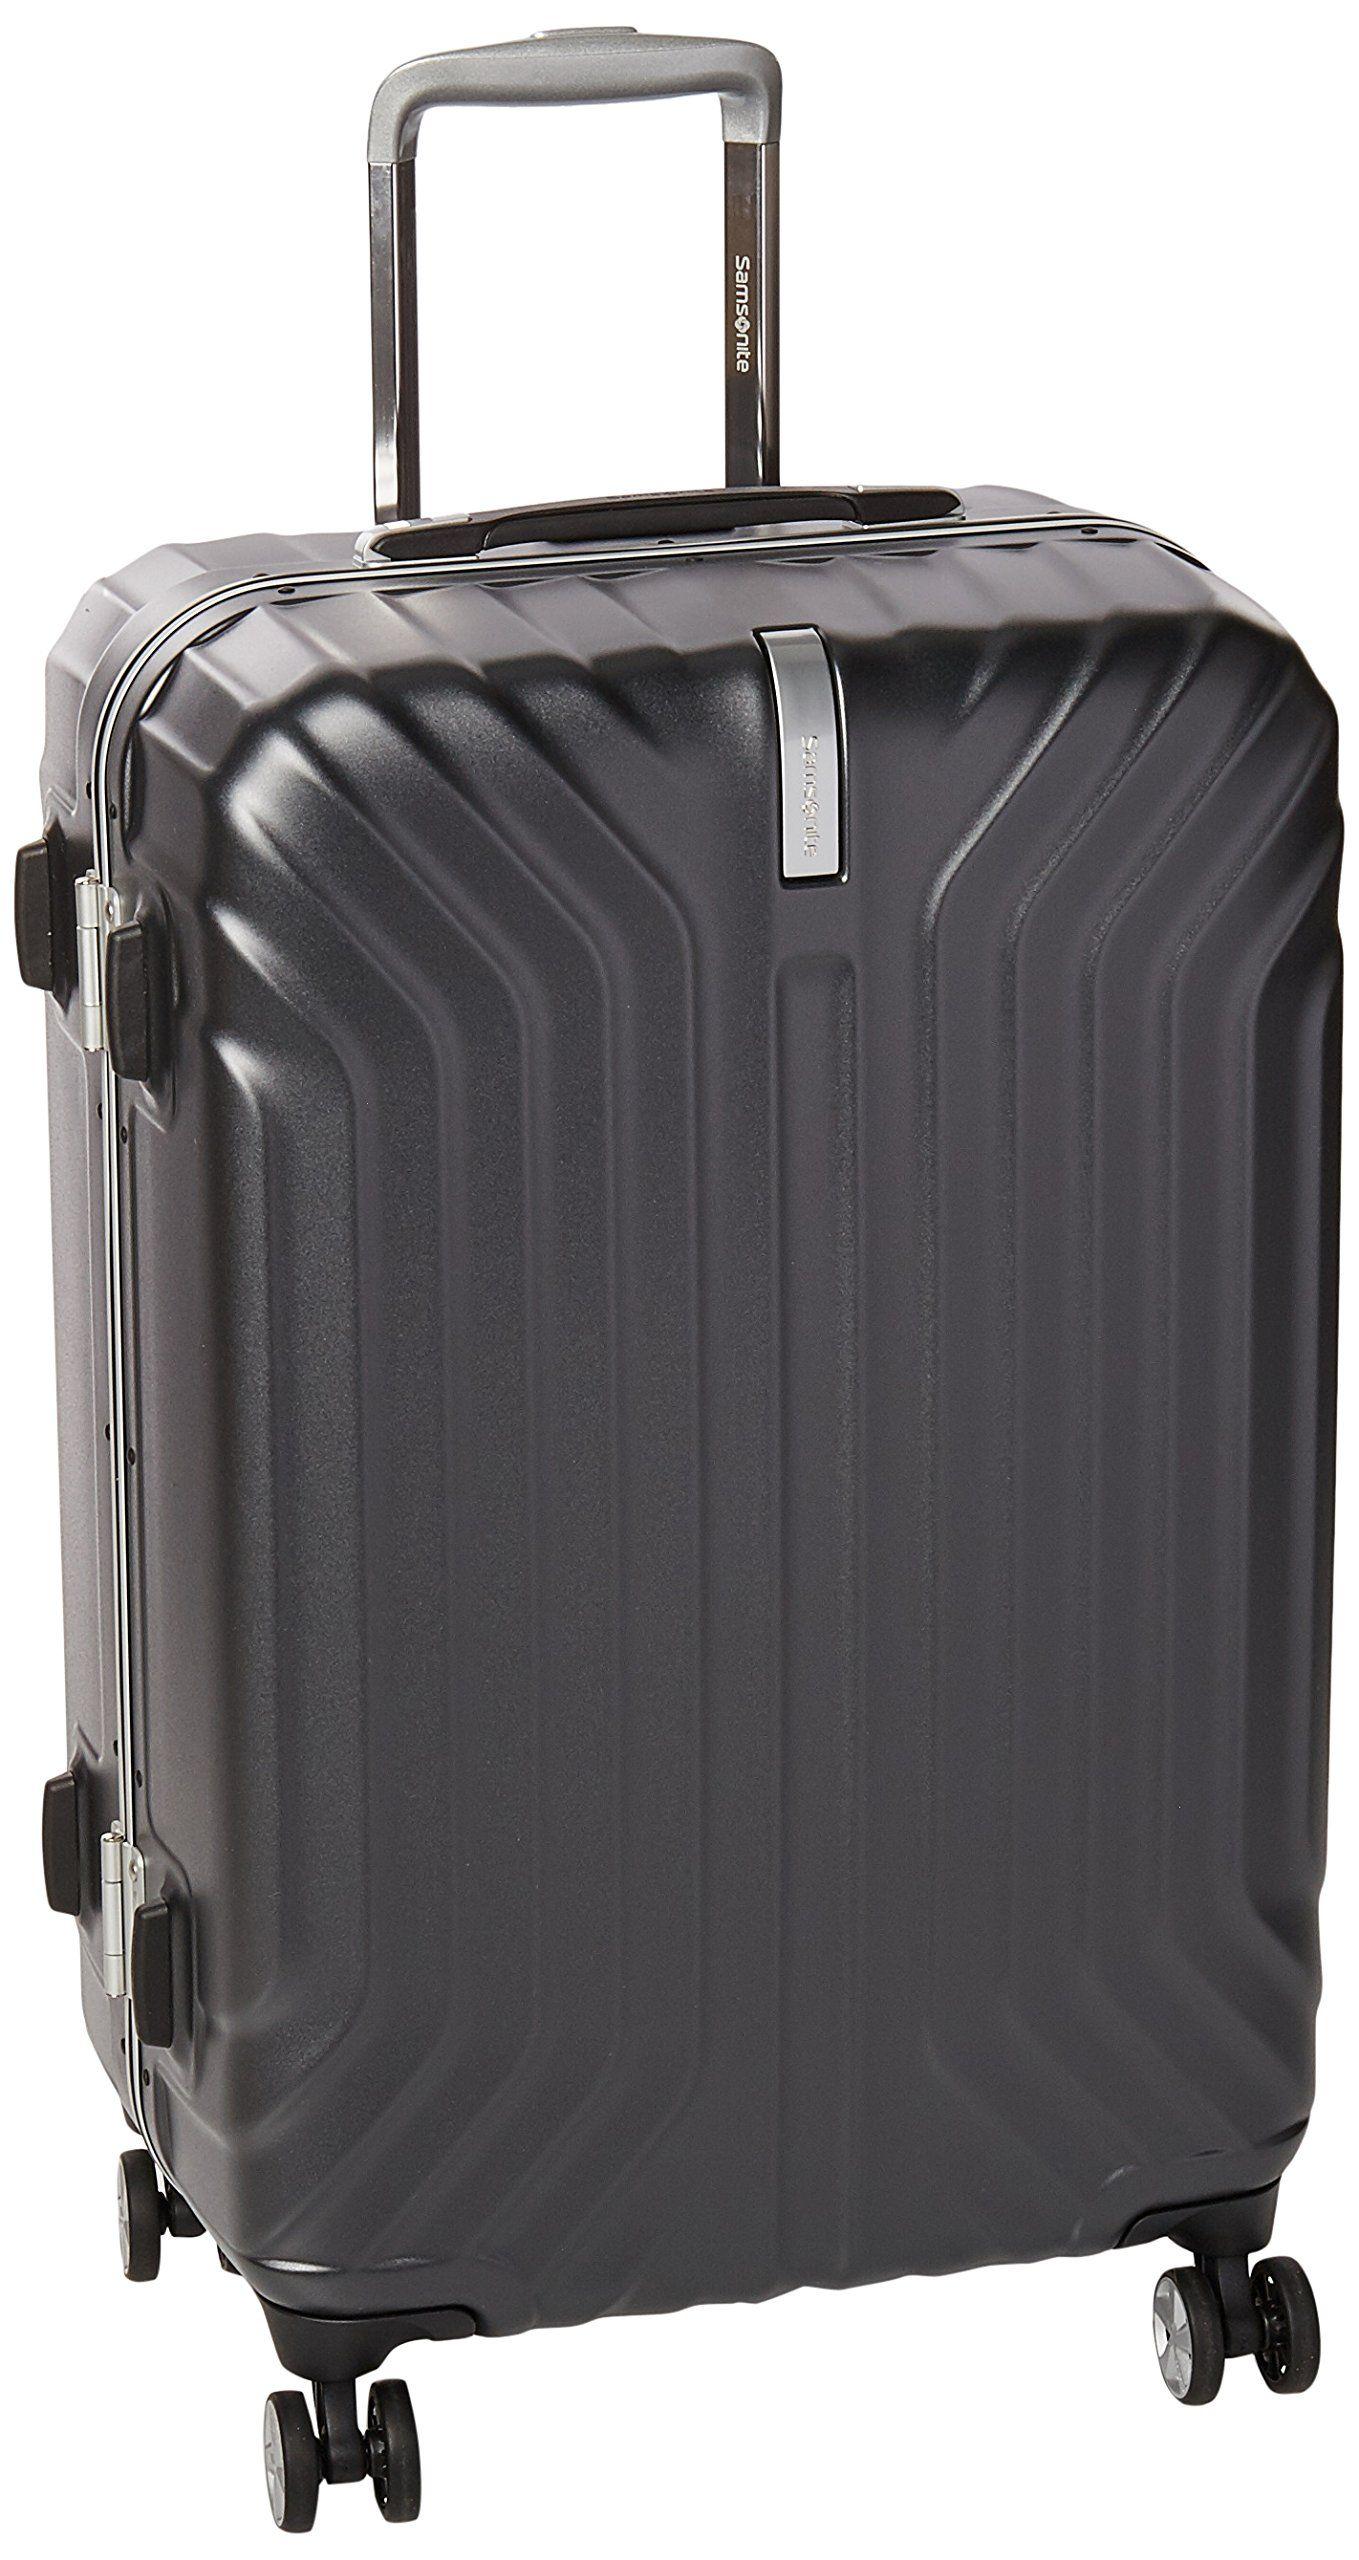 Samsonite Tru Frame Hardside Spinner 25 Suitcases Matte Graphite